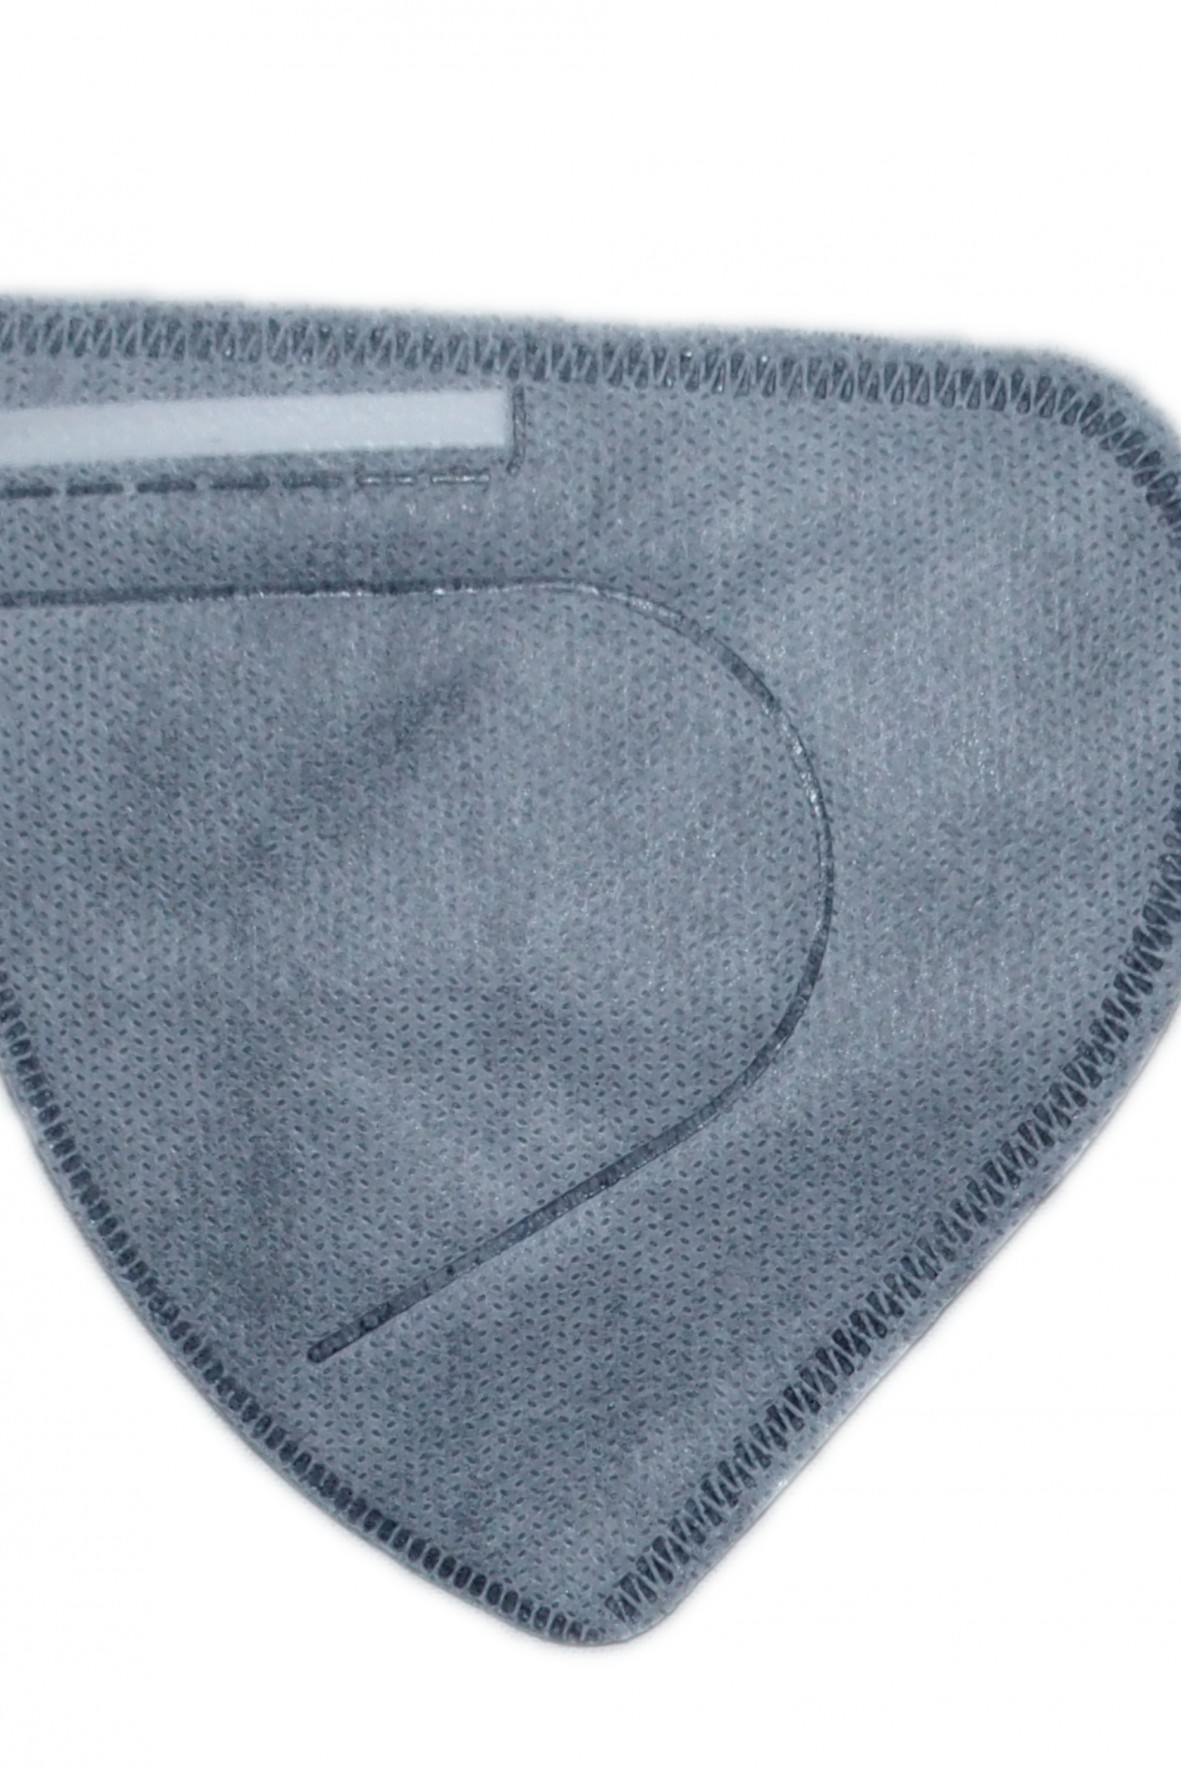 Filtr do maski antysmogowej